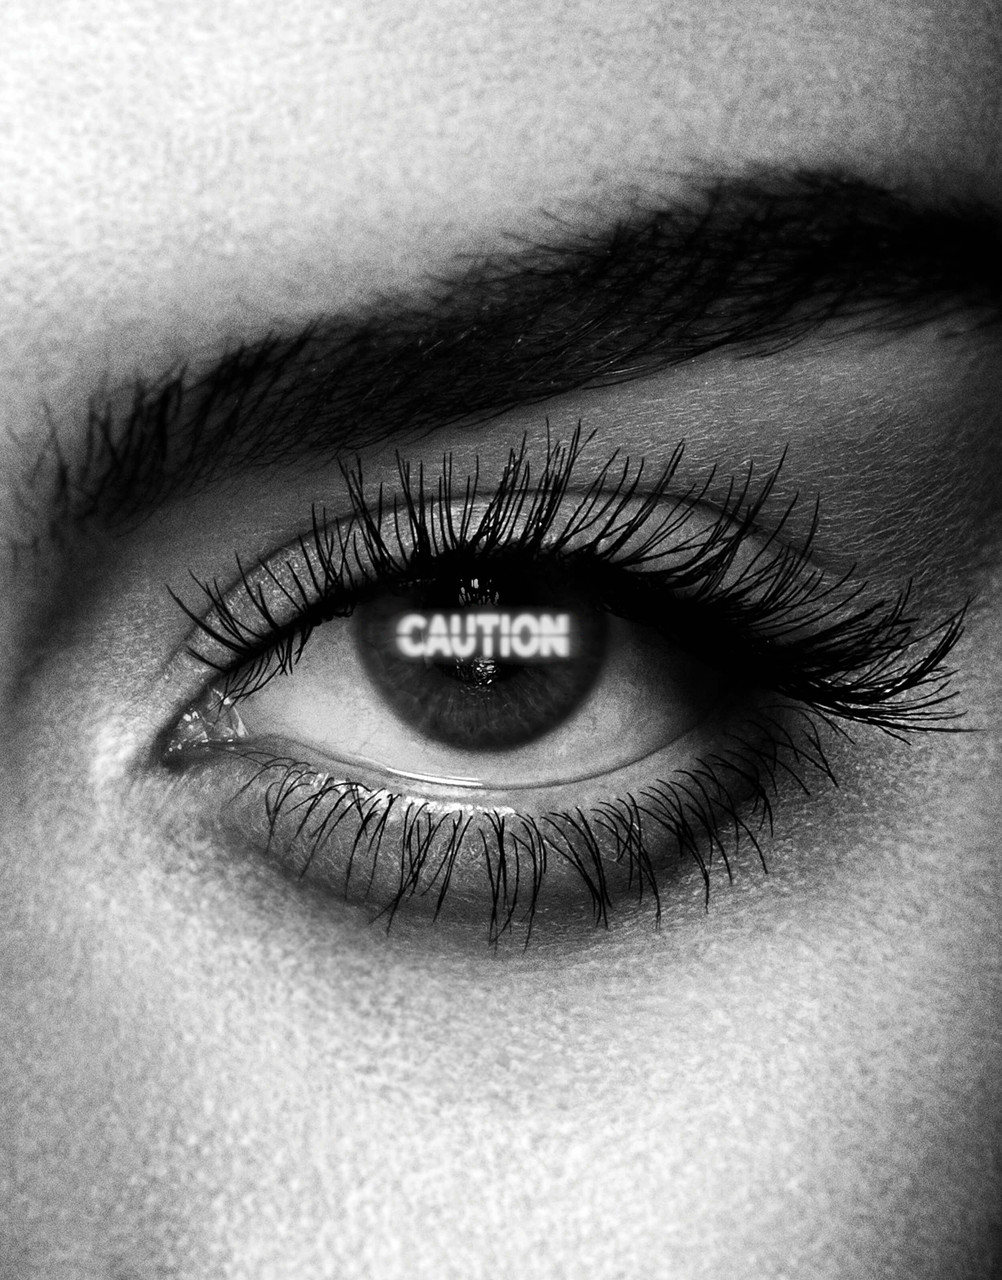 Объемная тушь HOURGLASS Caution Extreme Lash Mascara